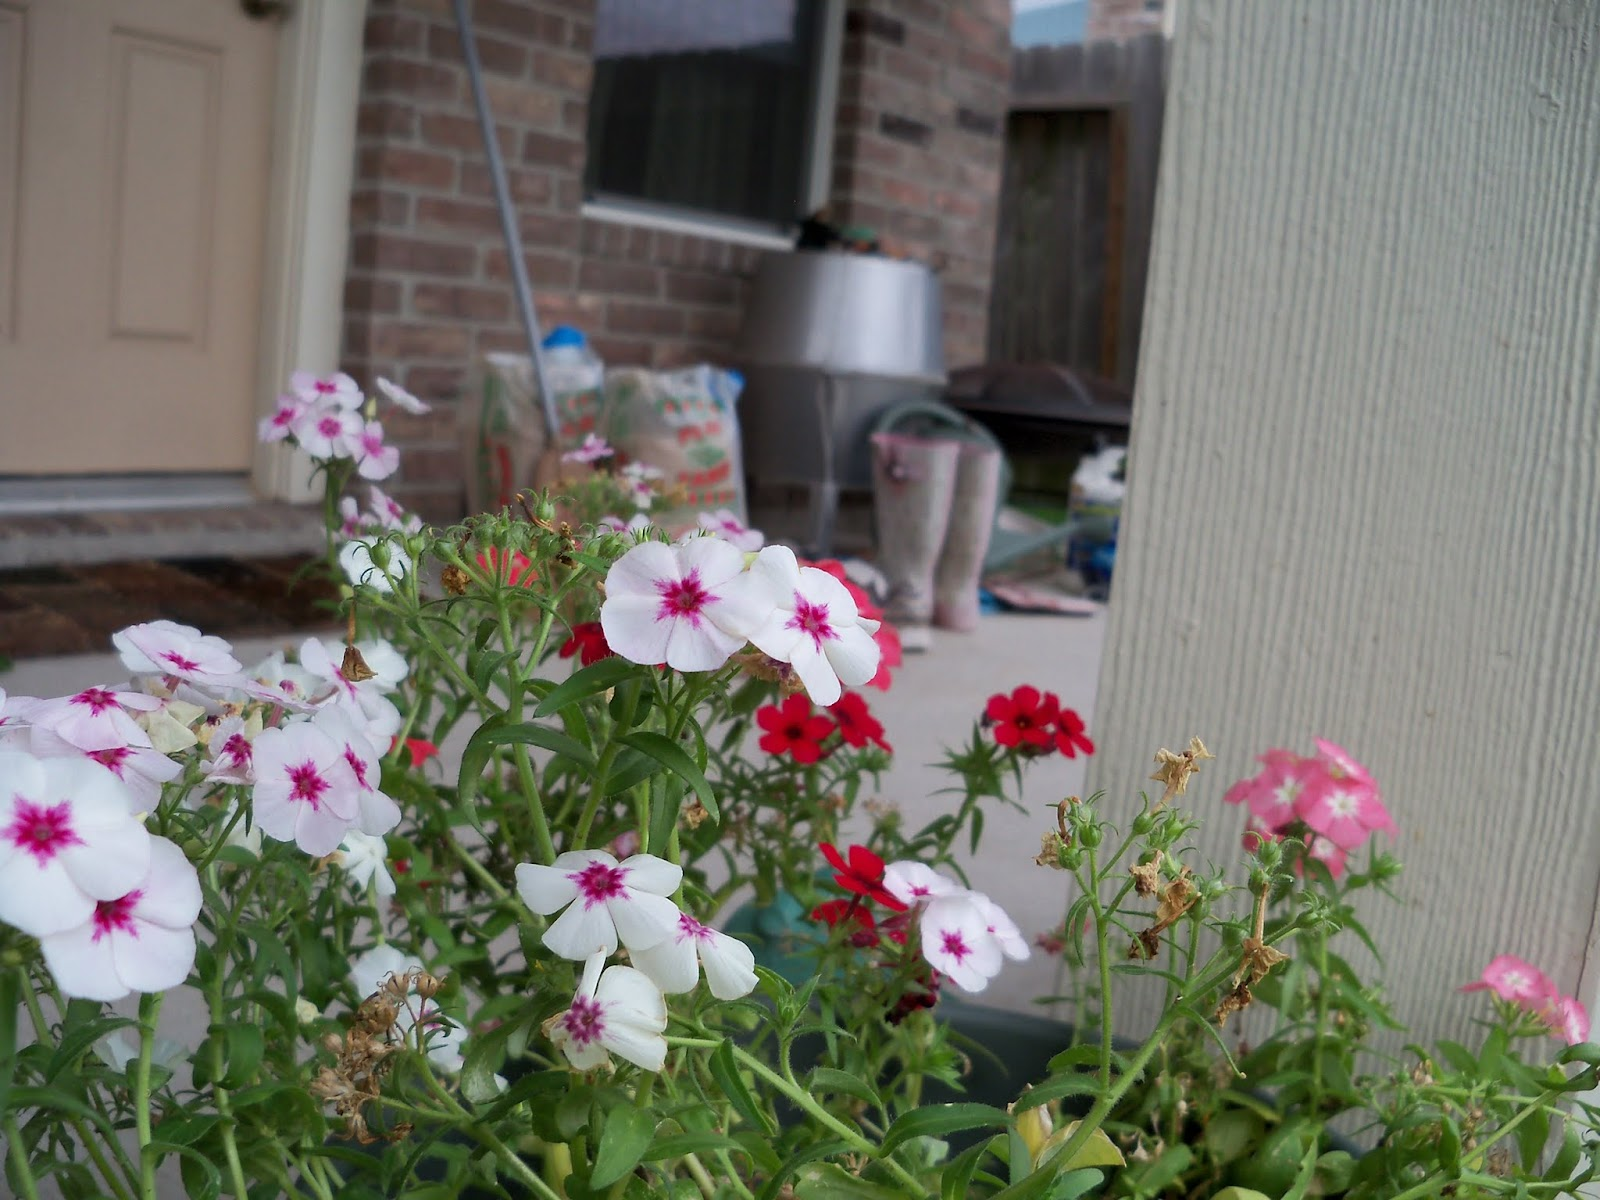 Gardening 2013 - 115_6088.JPG